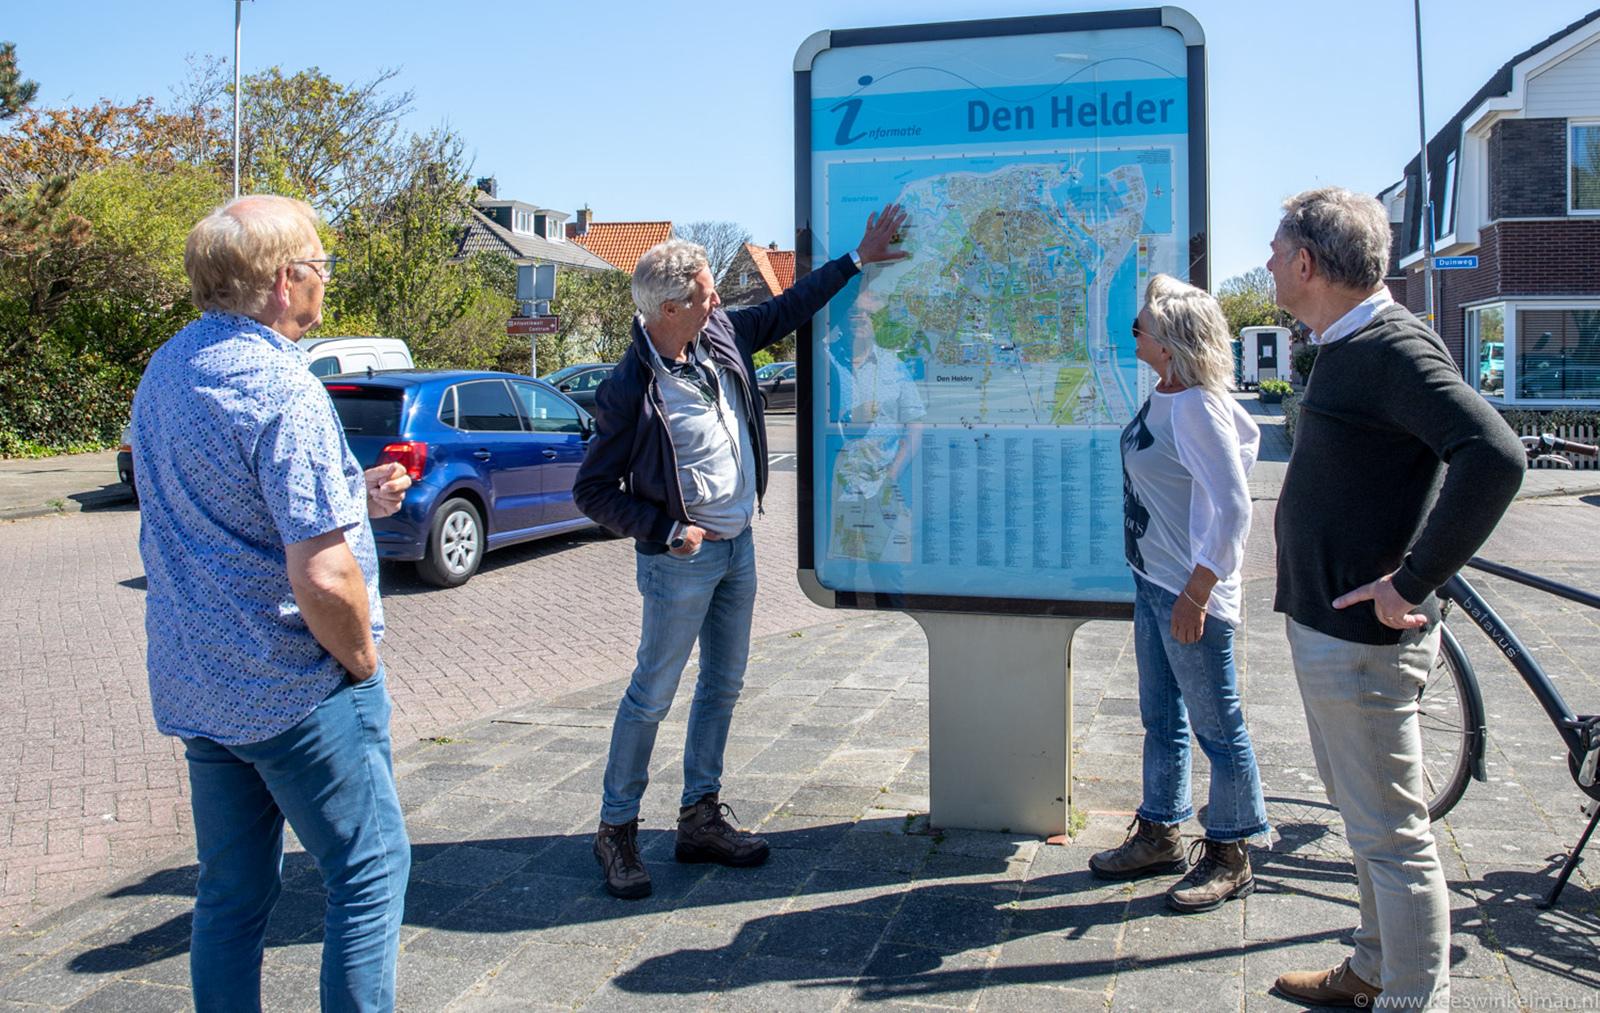 AO Willem Stam Kees Winkelman Den Helder bord 1600